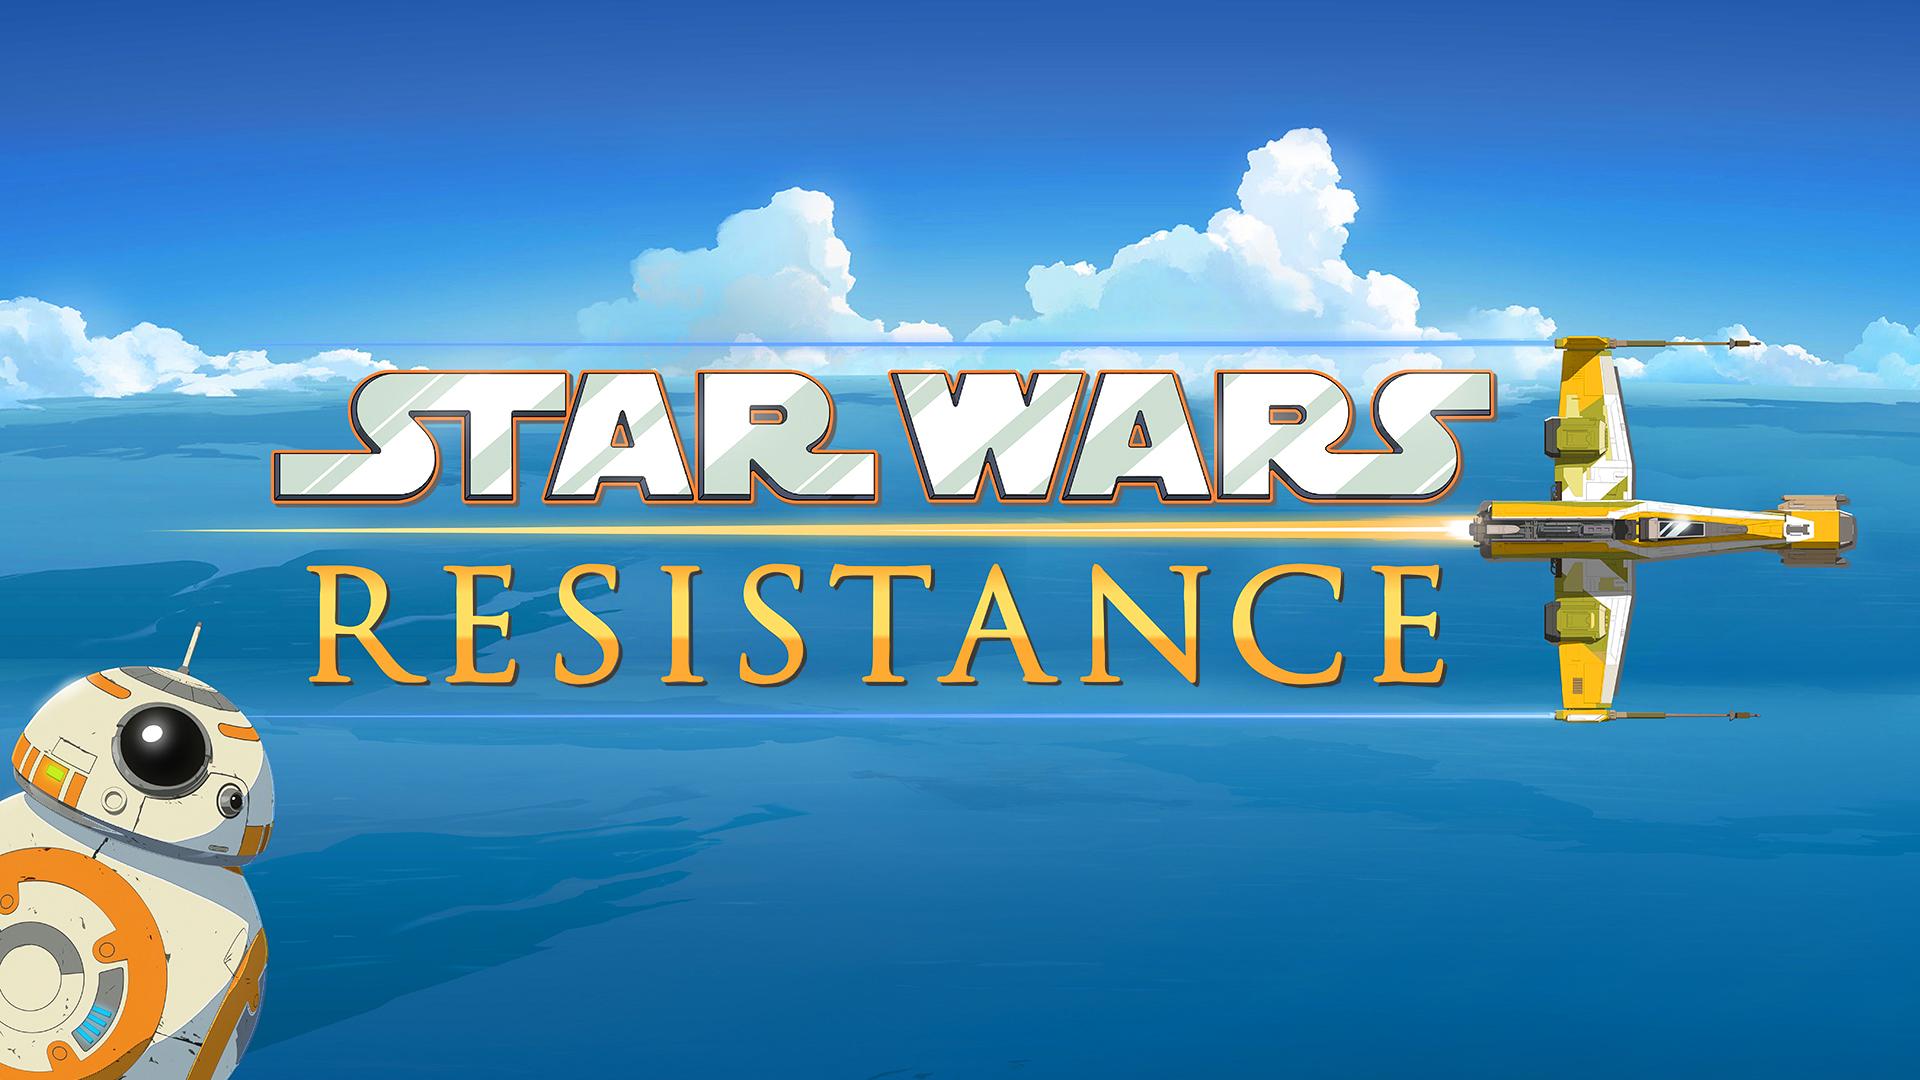 animation dave-filoni disney-xd gwendoline-christie io9 lucasfilm oscar-isaac poe-dameron star-wars star-wars-rebels star-wars-resistance